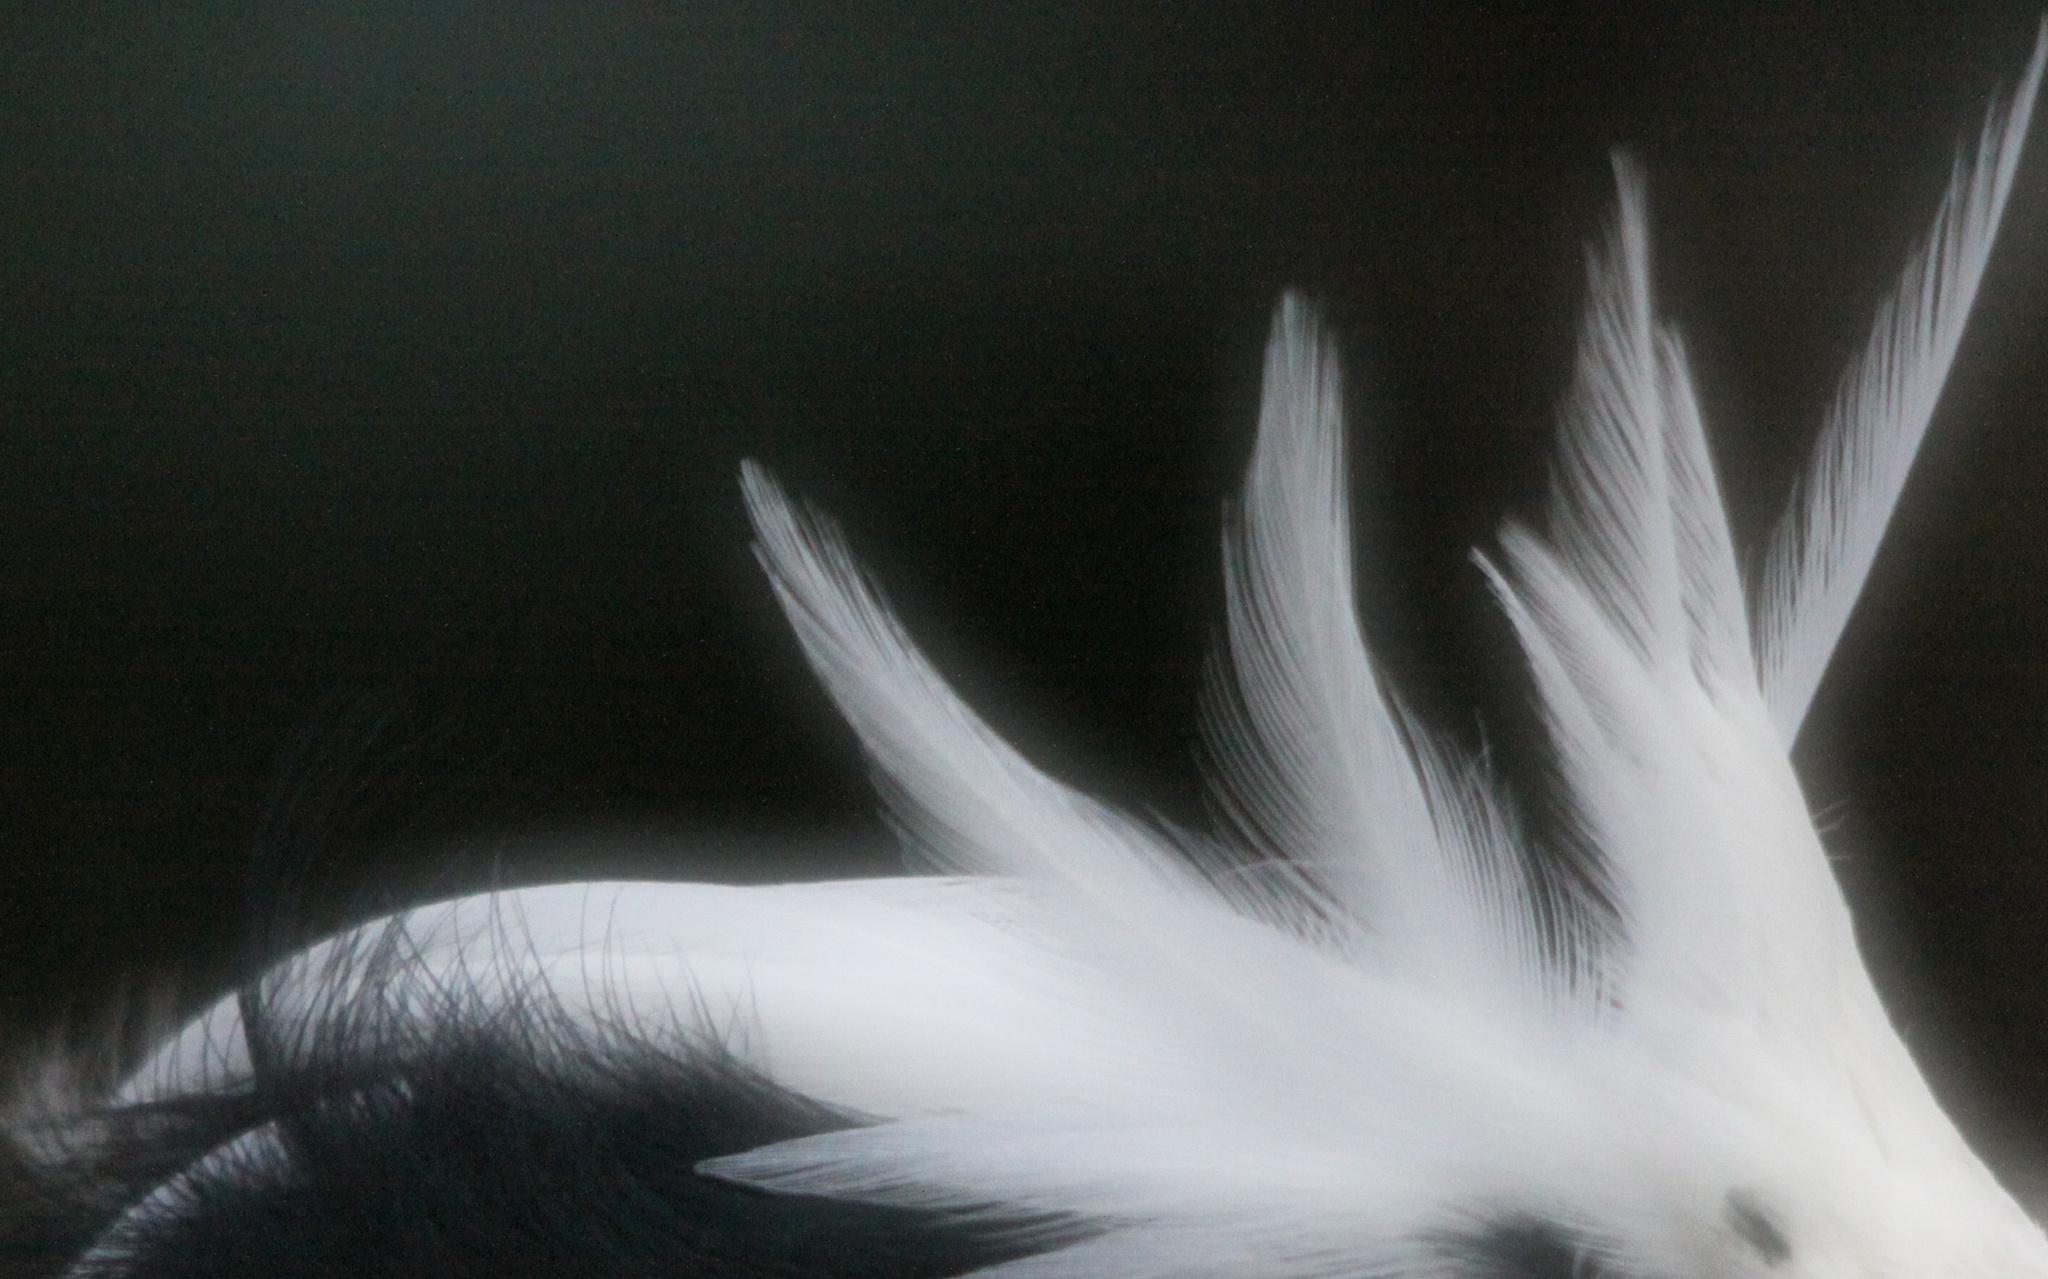 Artistic Feathers by Kaje